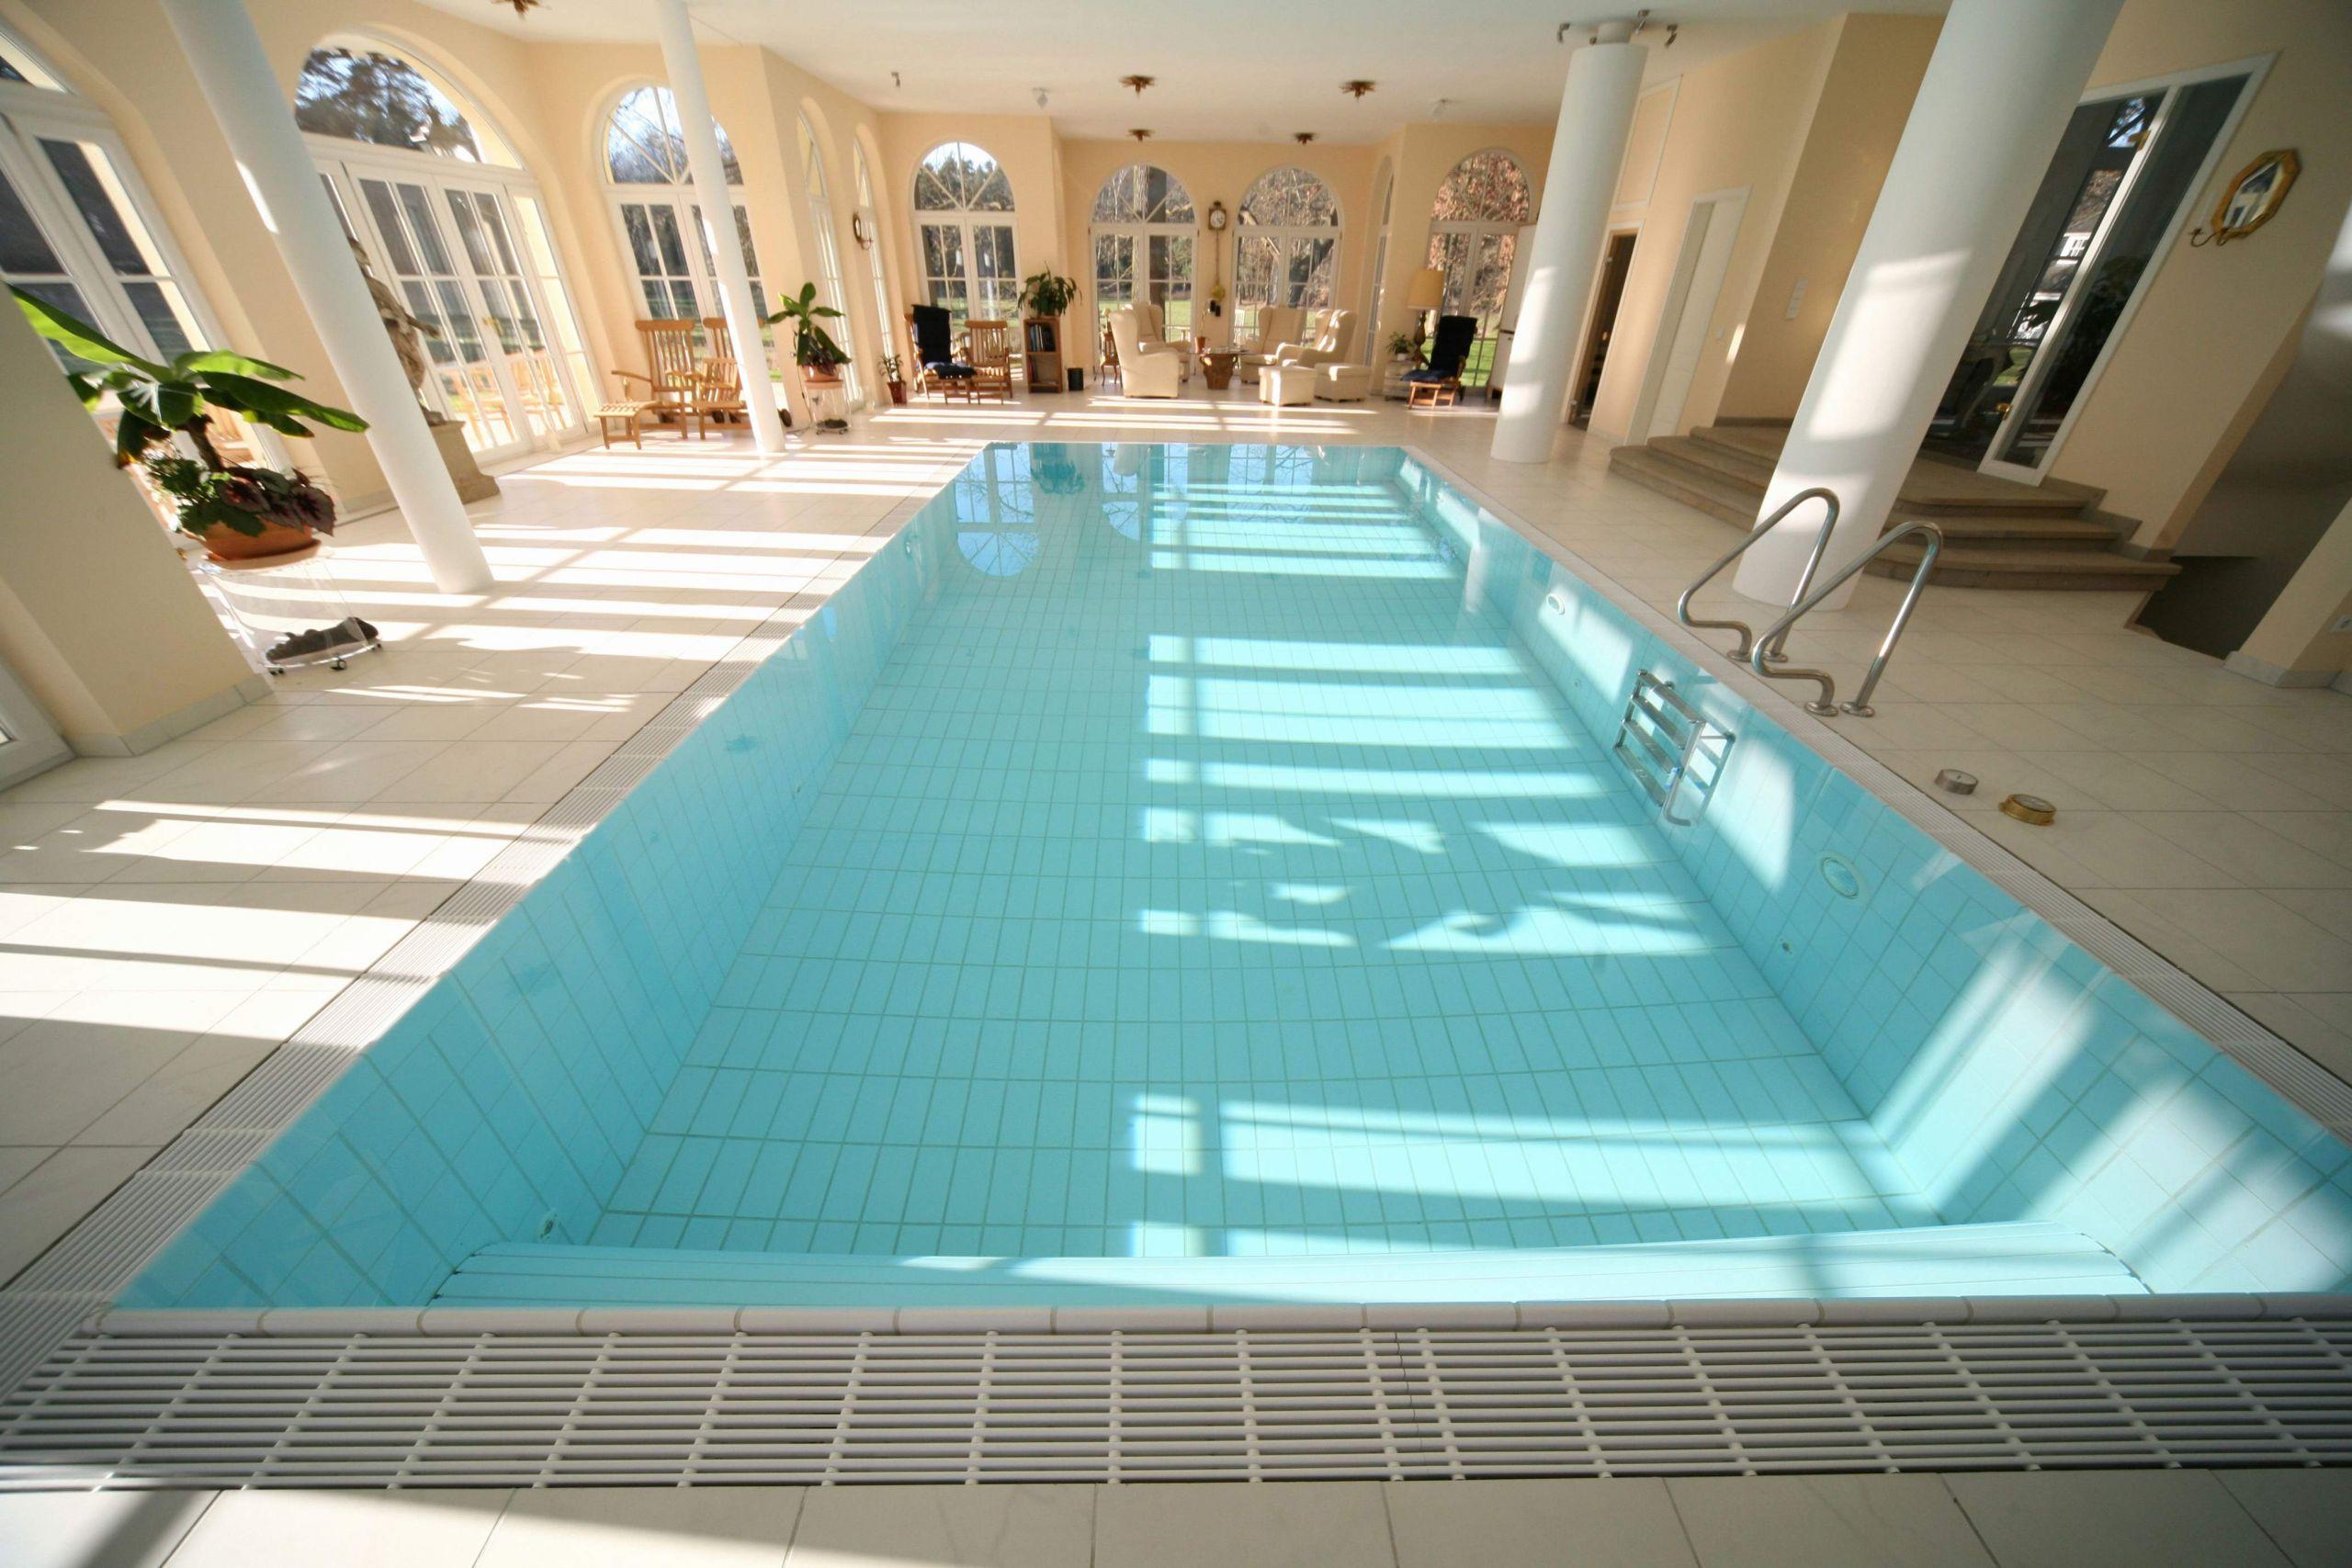 Swimming Pool Garten Frisch Swimming Pool Leipzig — Temobardz Home Blog